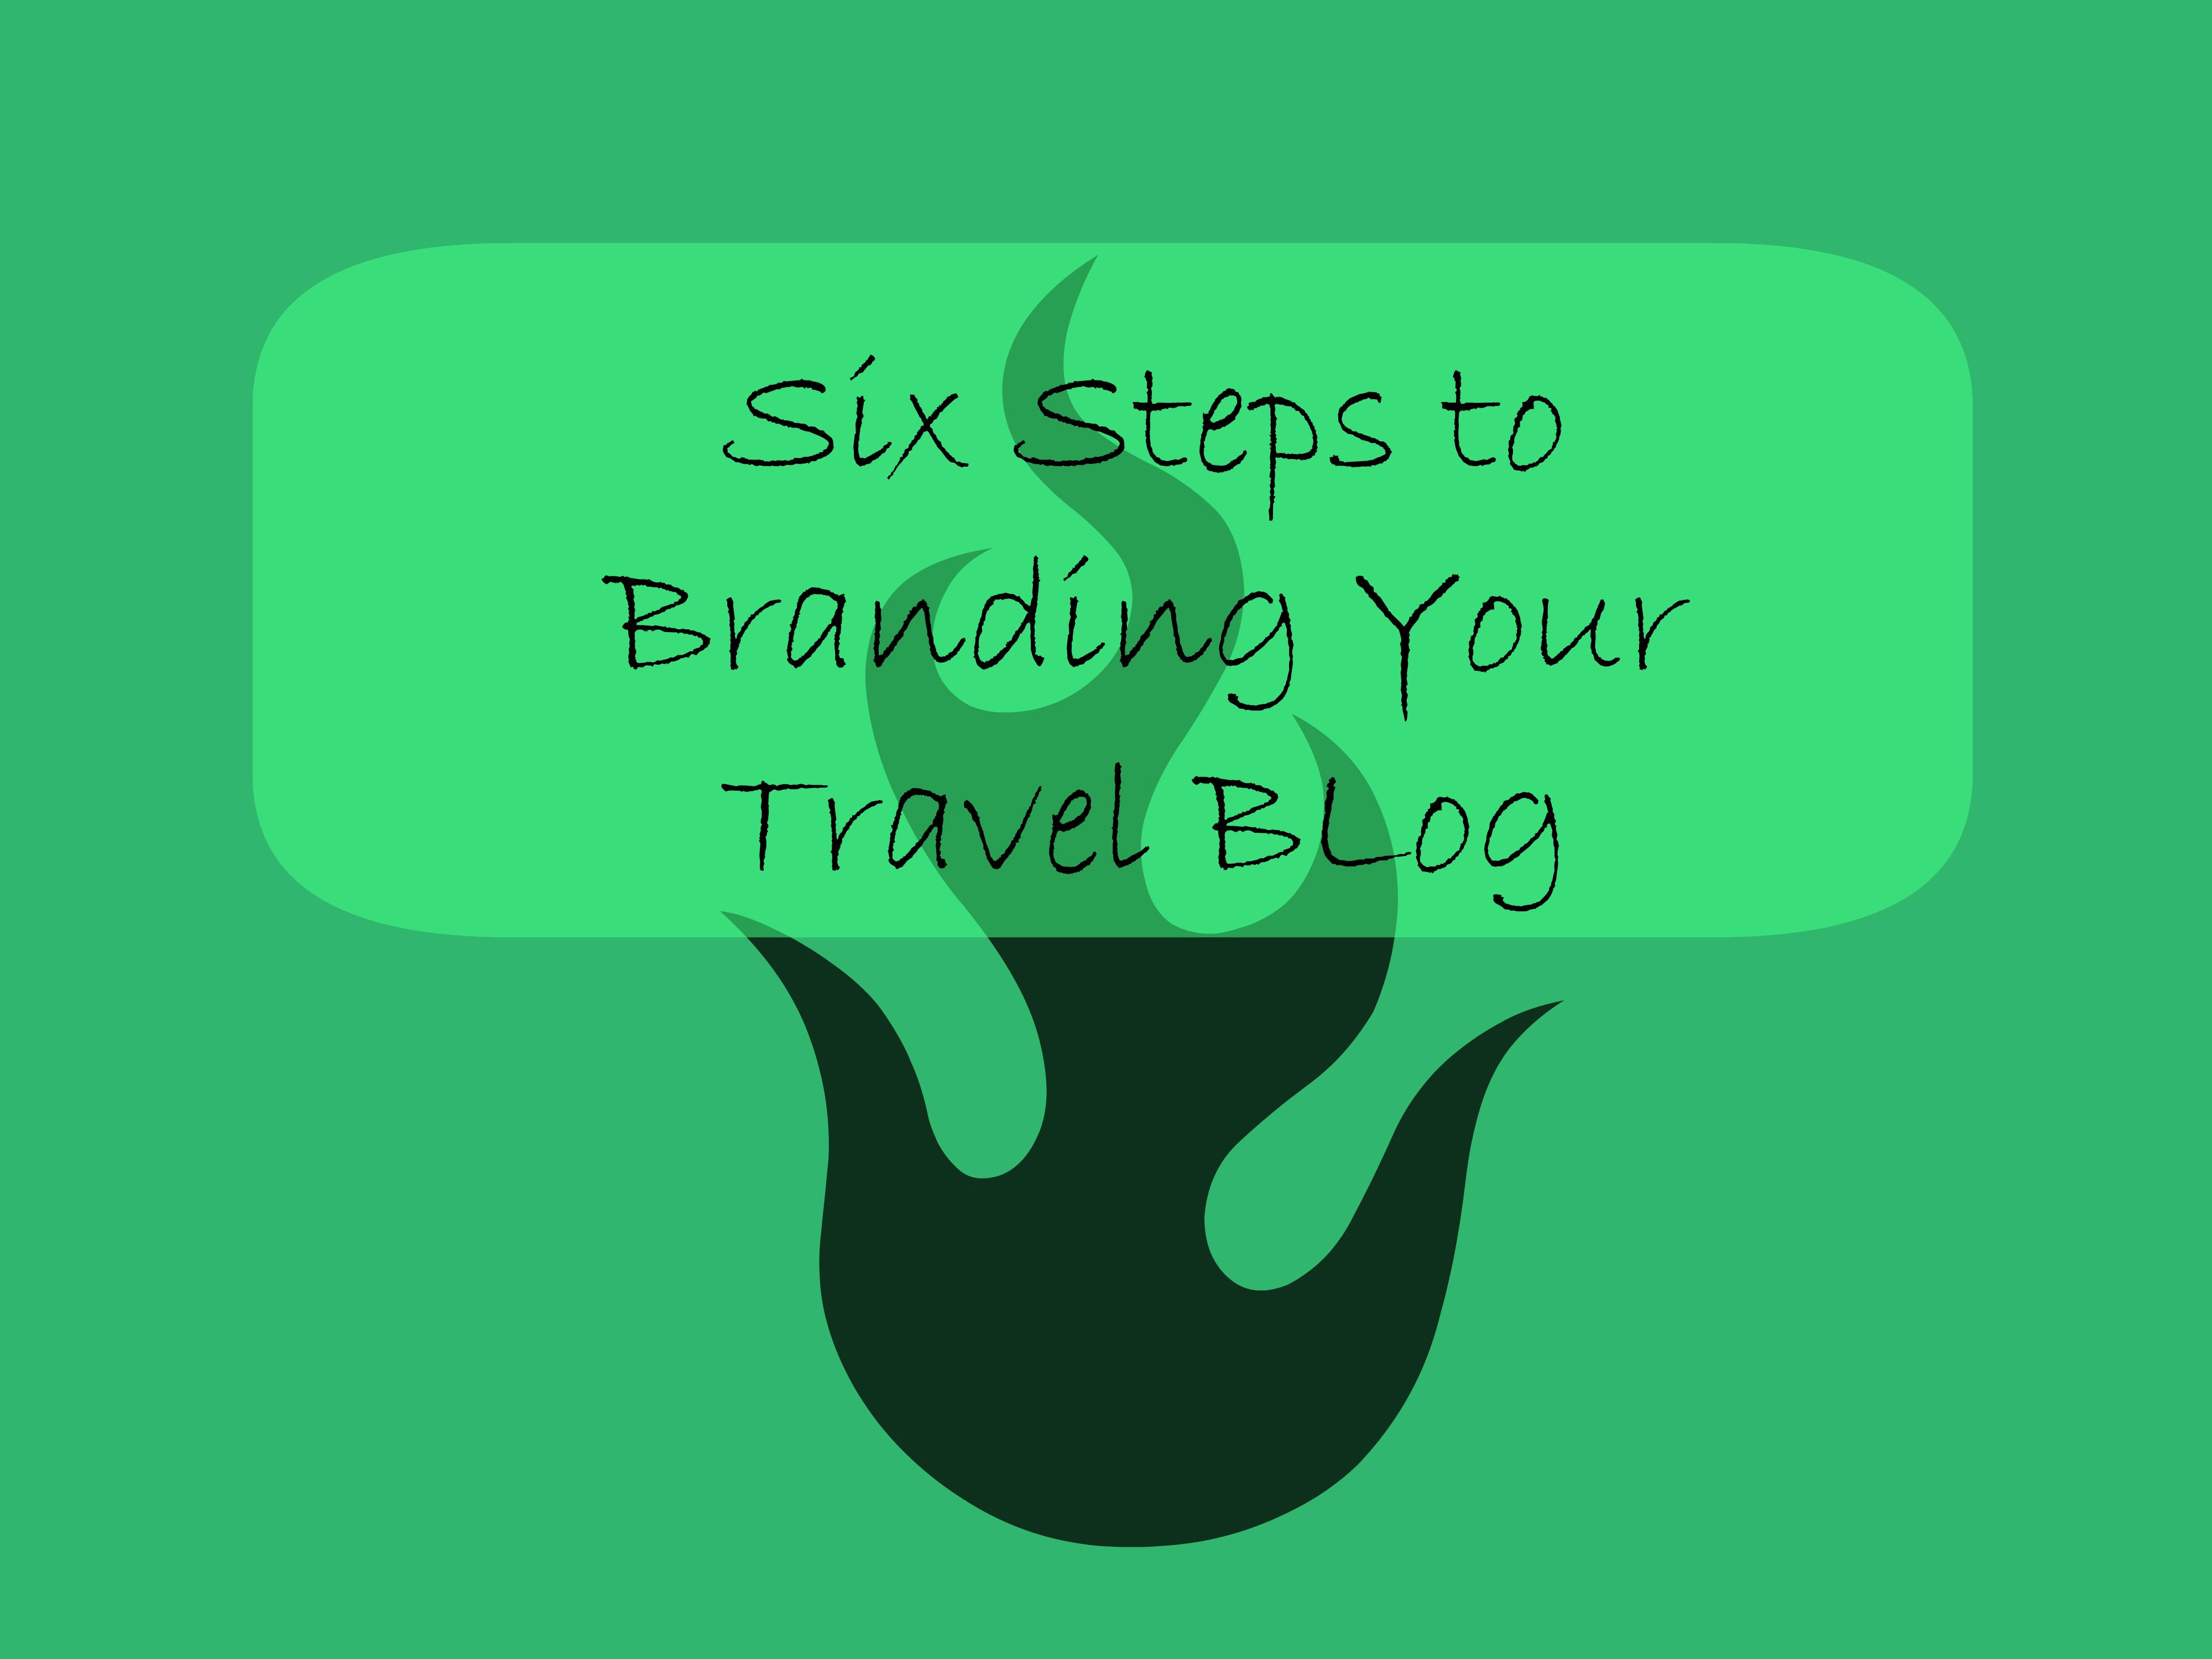 Travel Blogging: Six Steps to Branding a Travel Blog - Independent